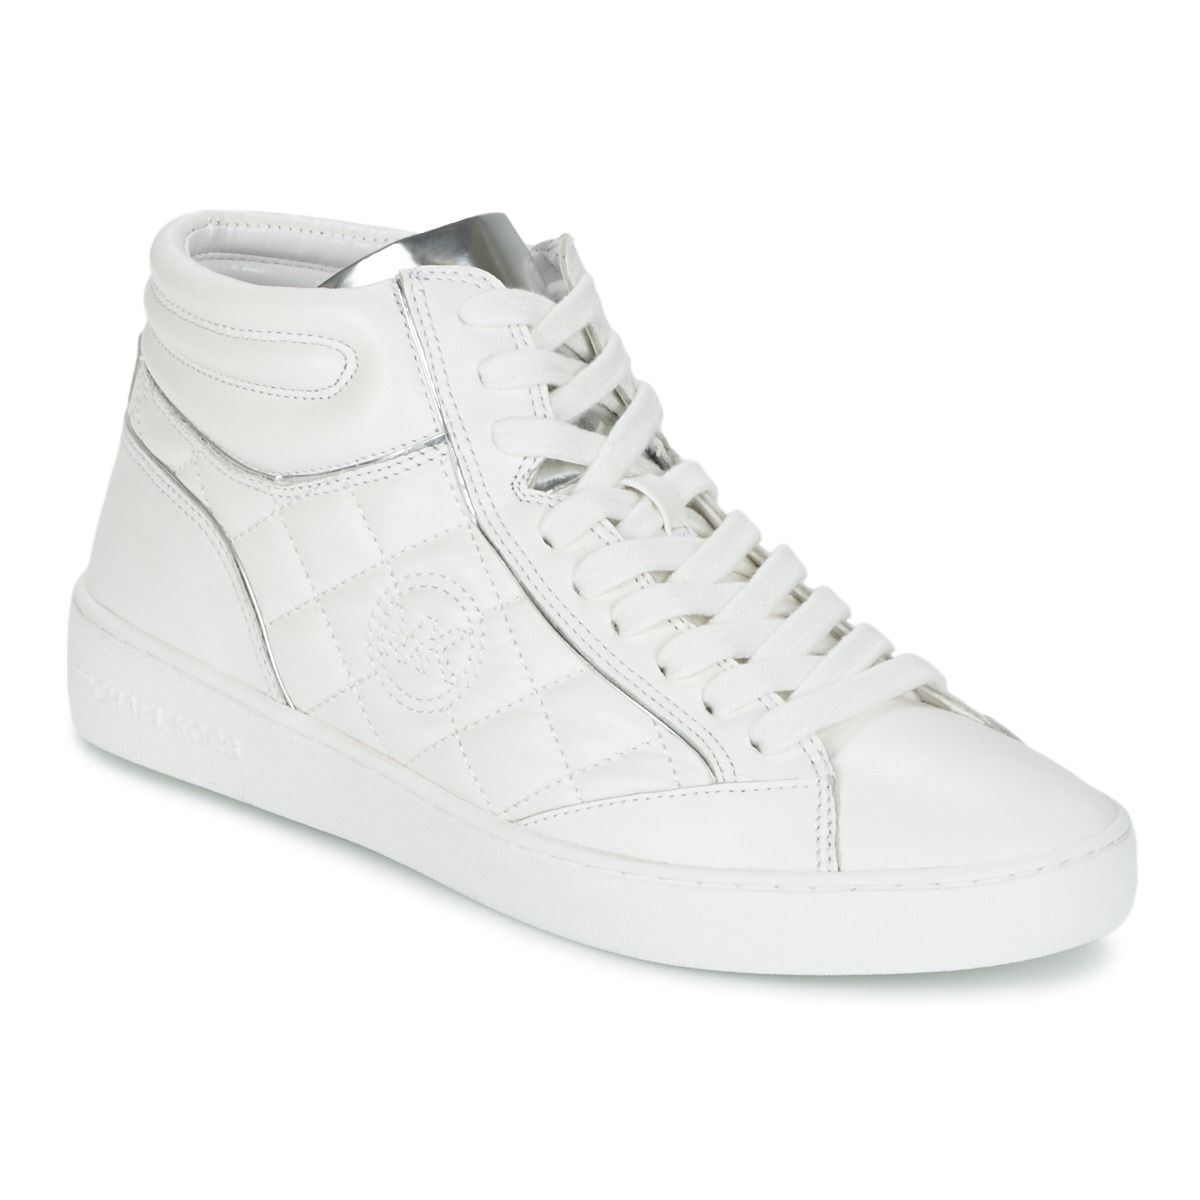 michael michael kors paige blanc kelvin michael kors sneakers shoes